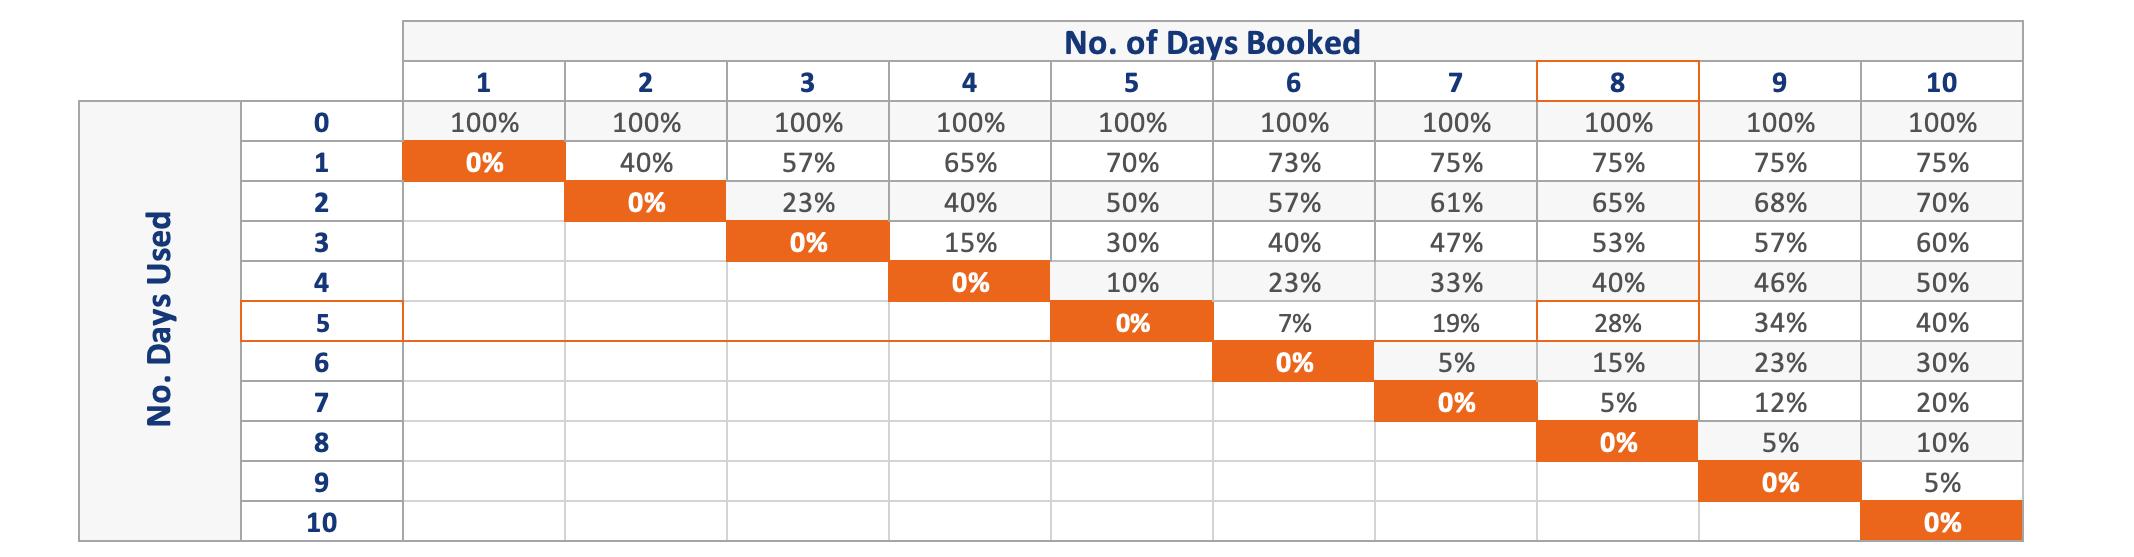 Example of Premium Refund in Case of Cancellation